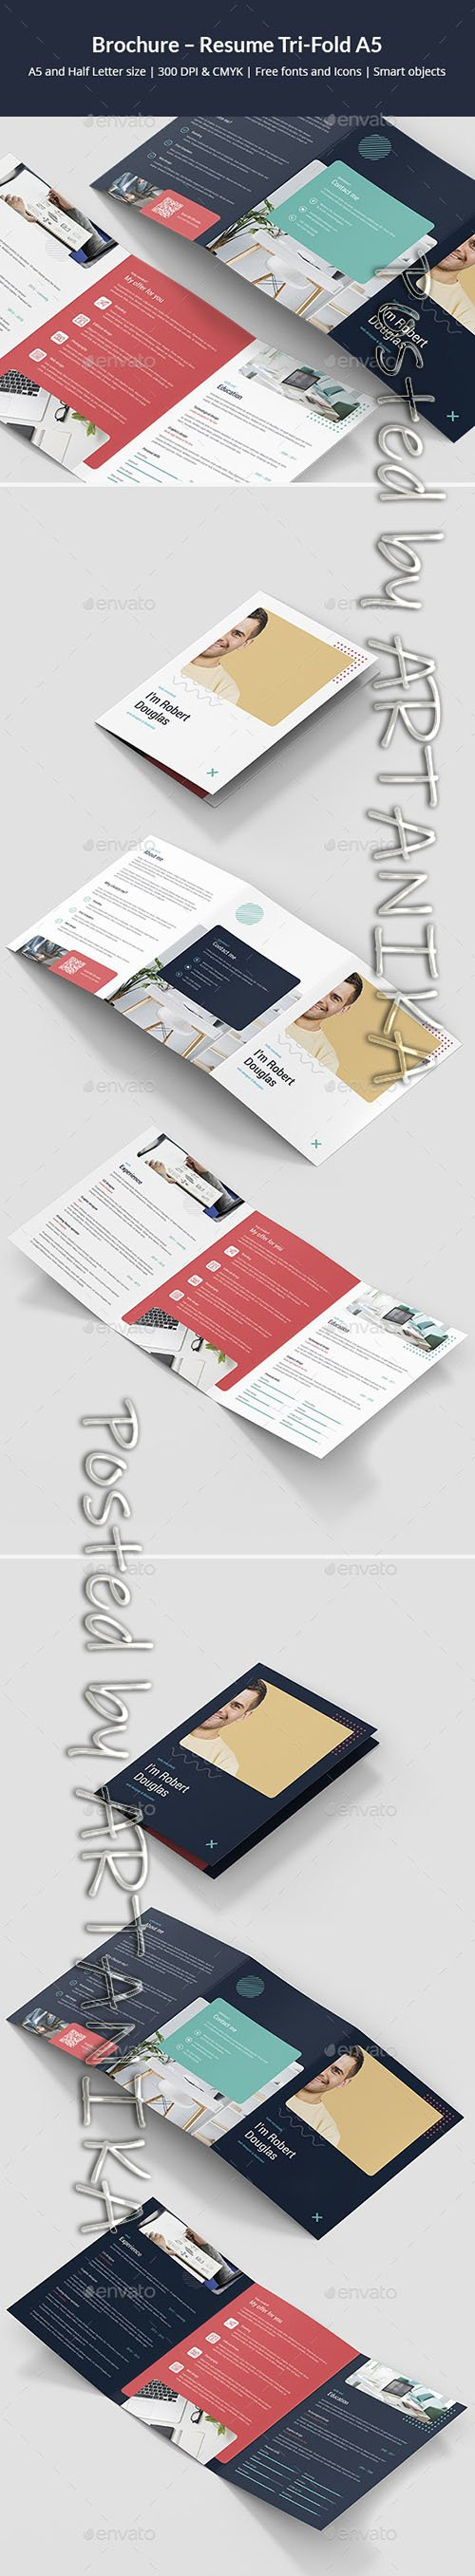 Brochure Resume Tri-Fold A5 24772483